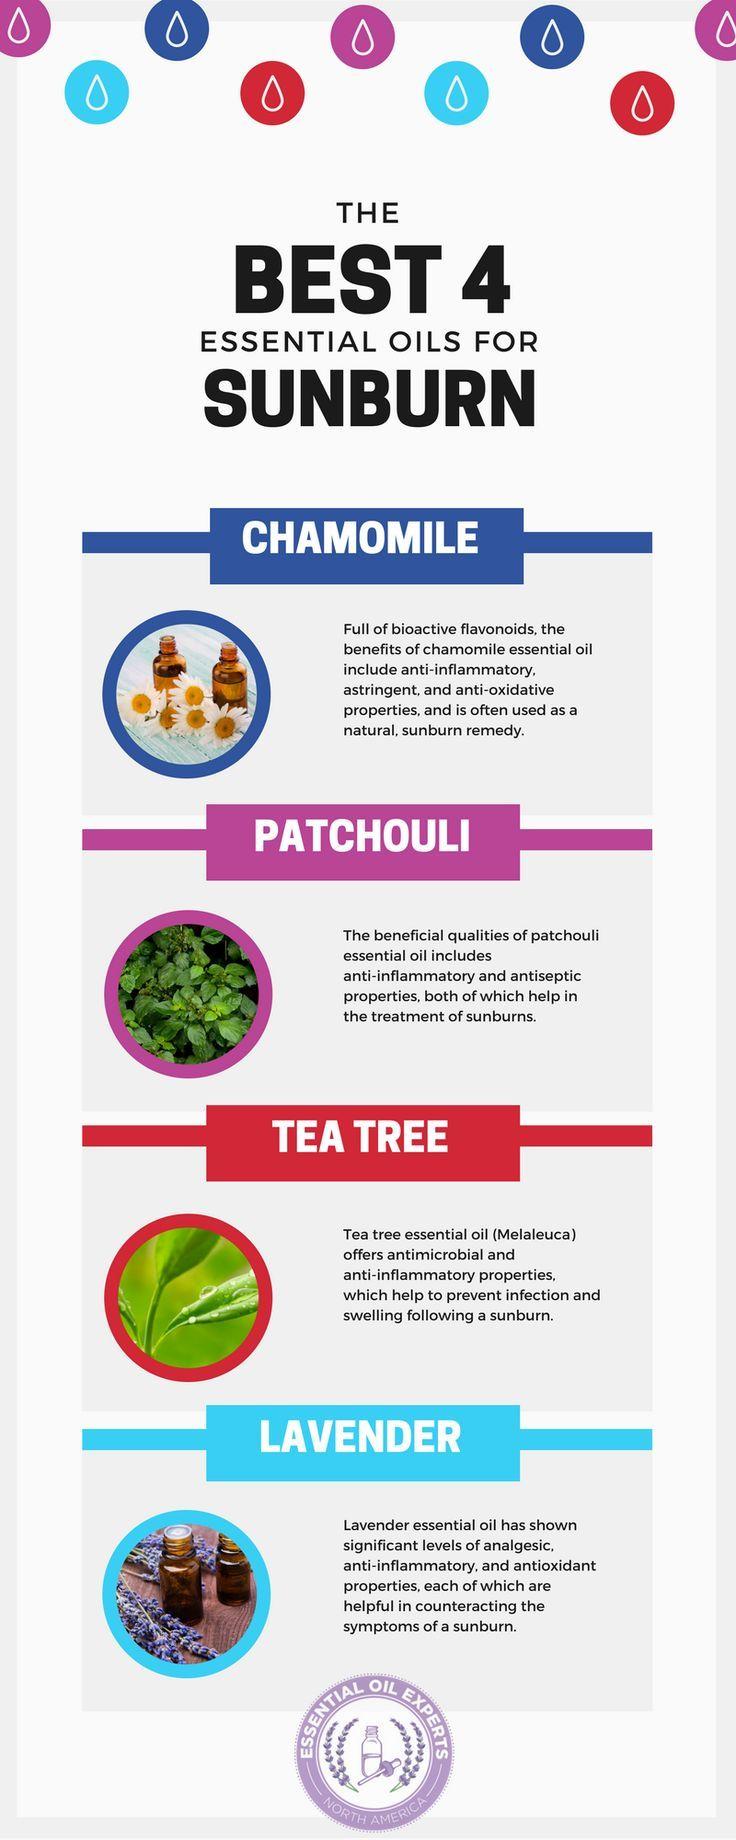 Best 4 Essential Oils for Sunburn